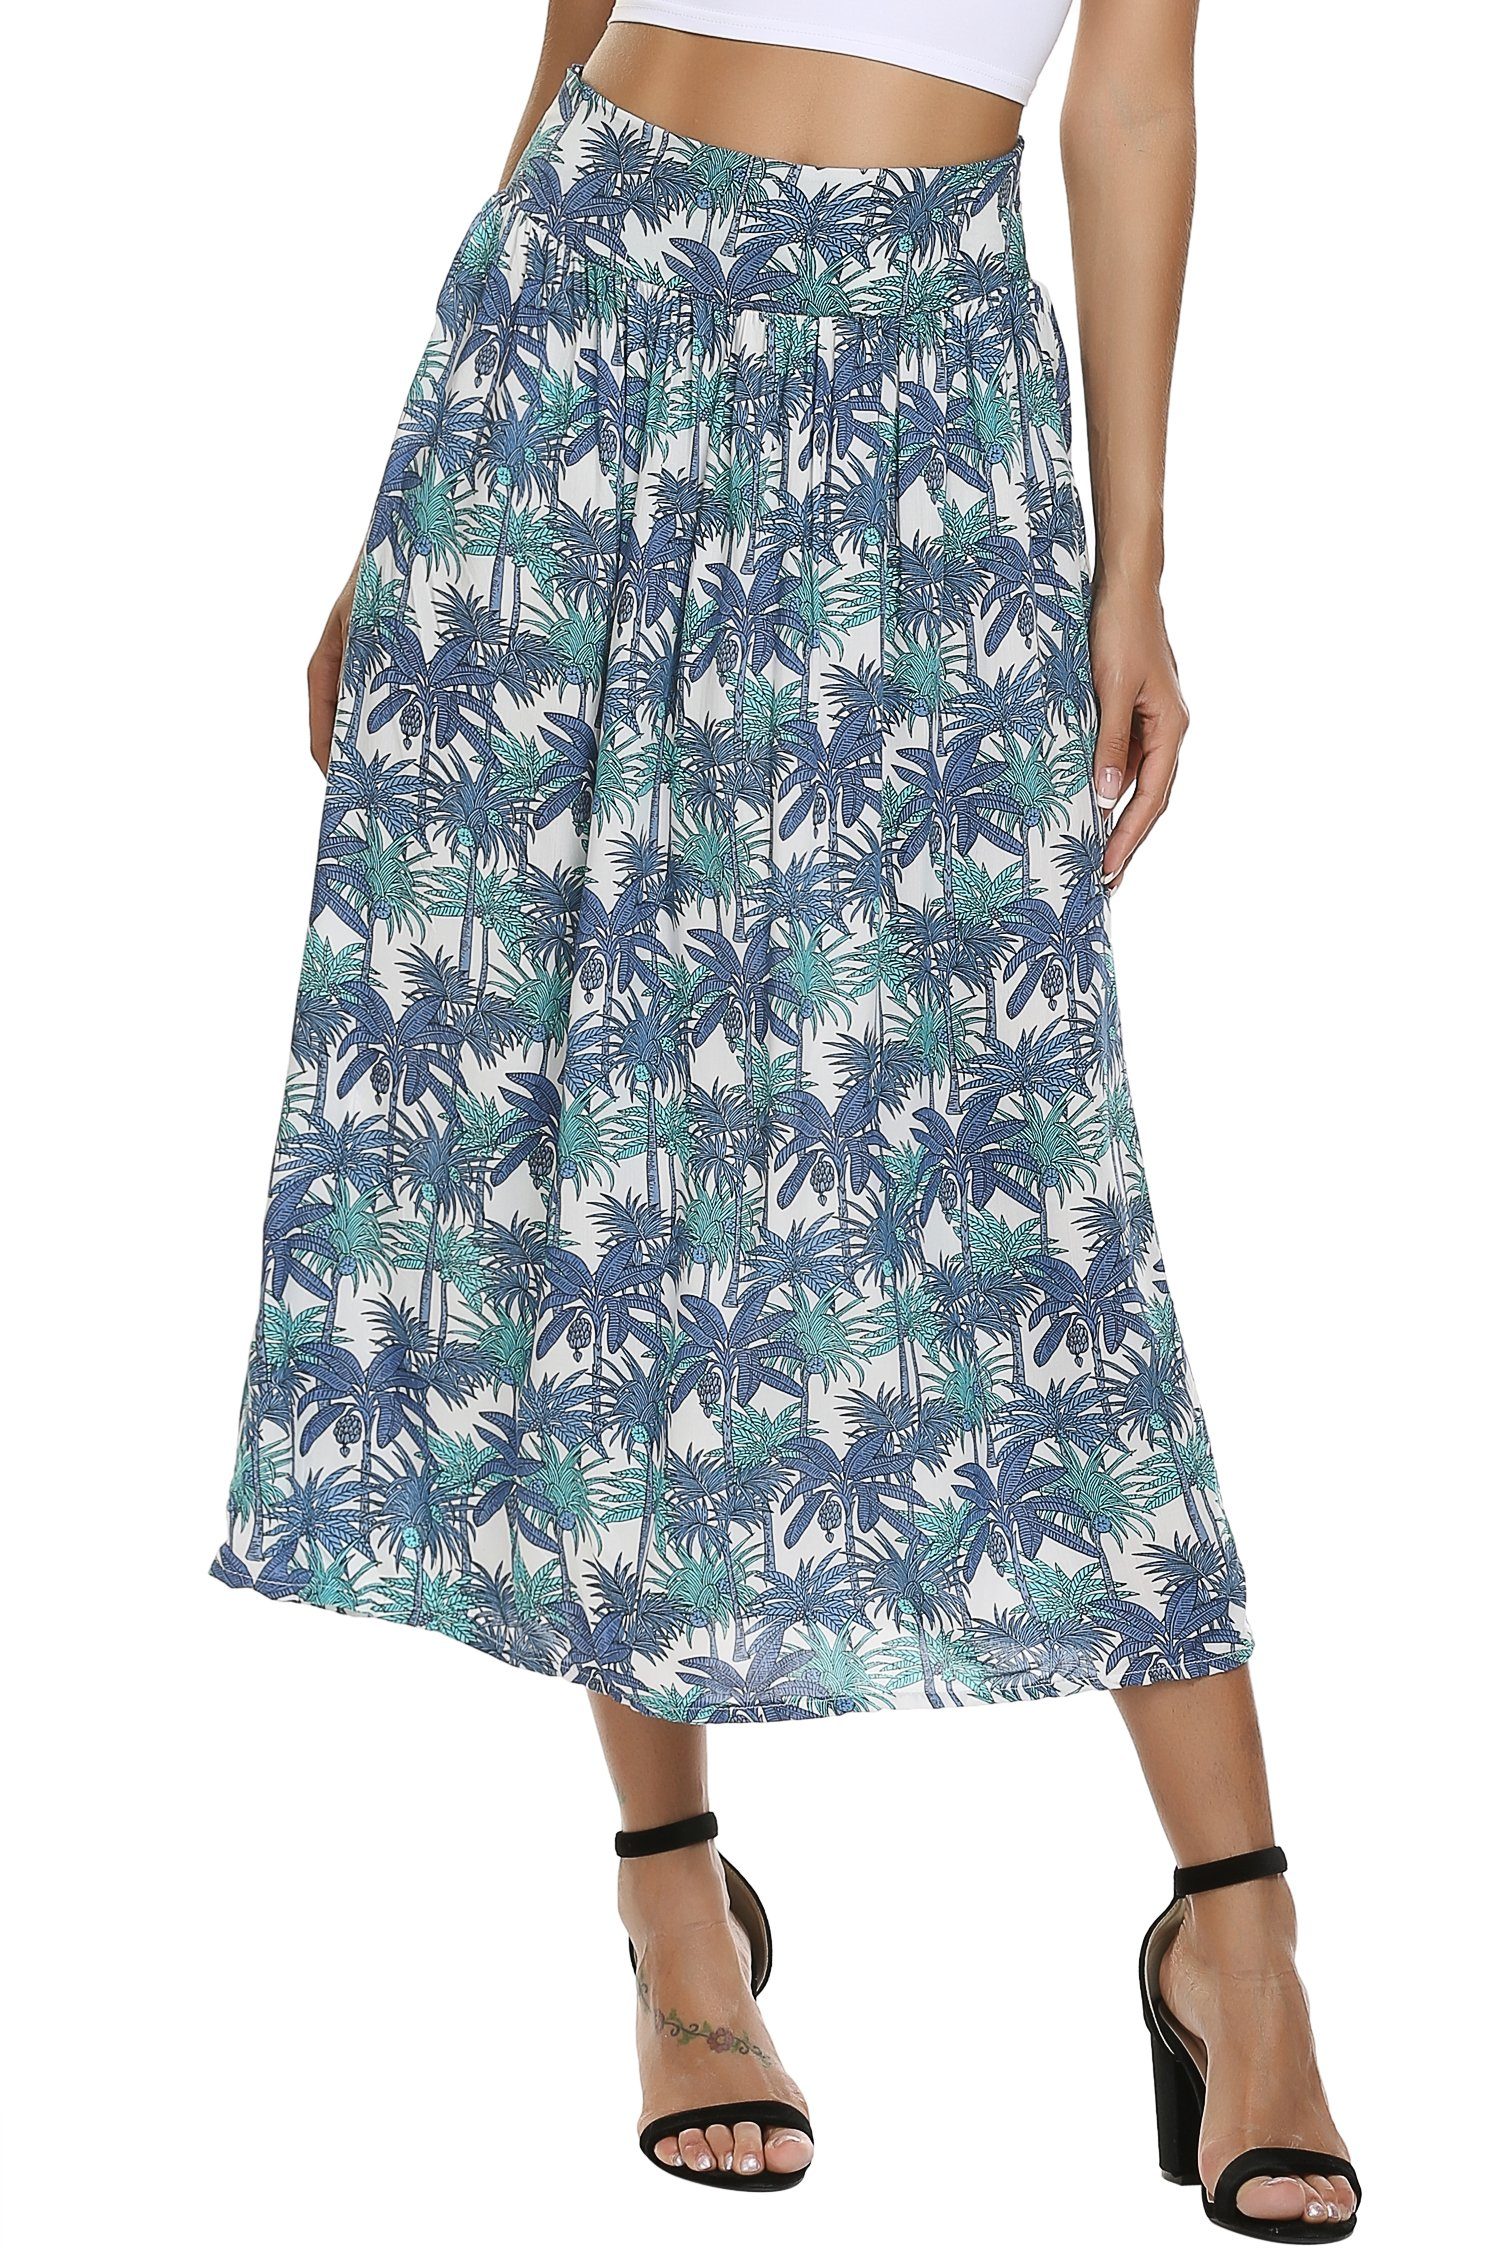 Zeagoo Women Fashion Multicolored Print High Waist Maxi Skirt Long Skirt